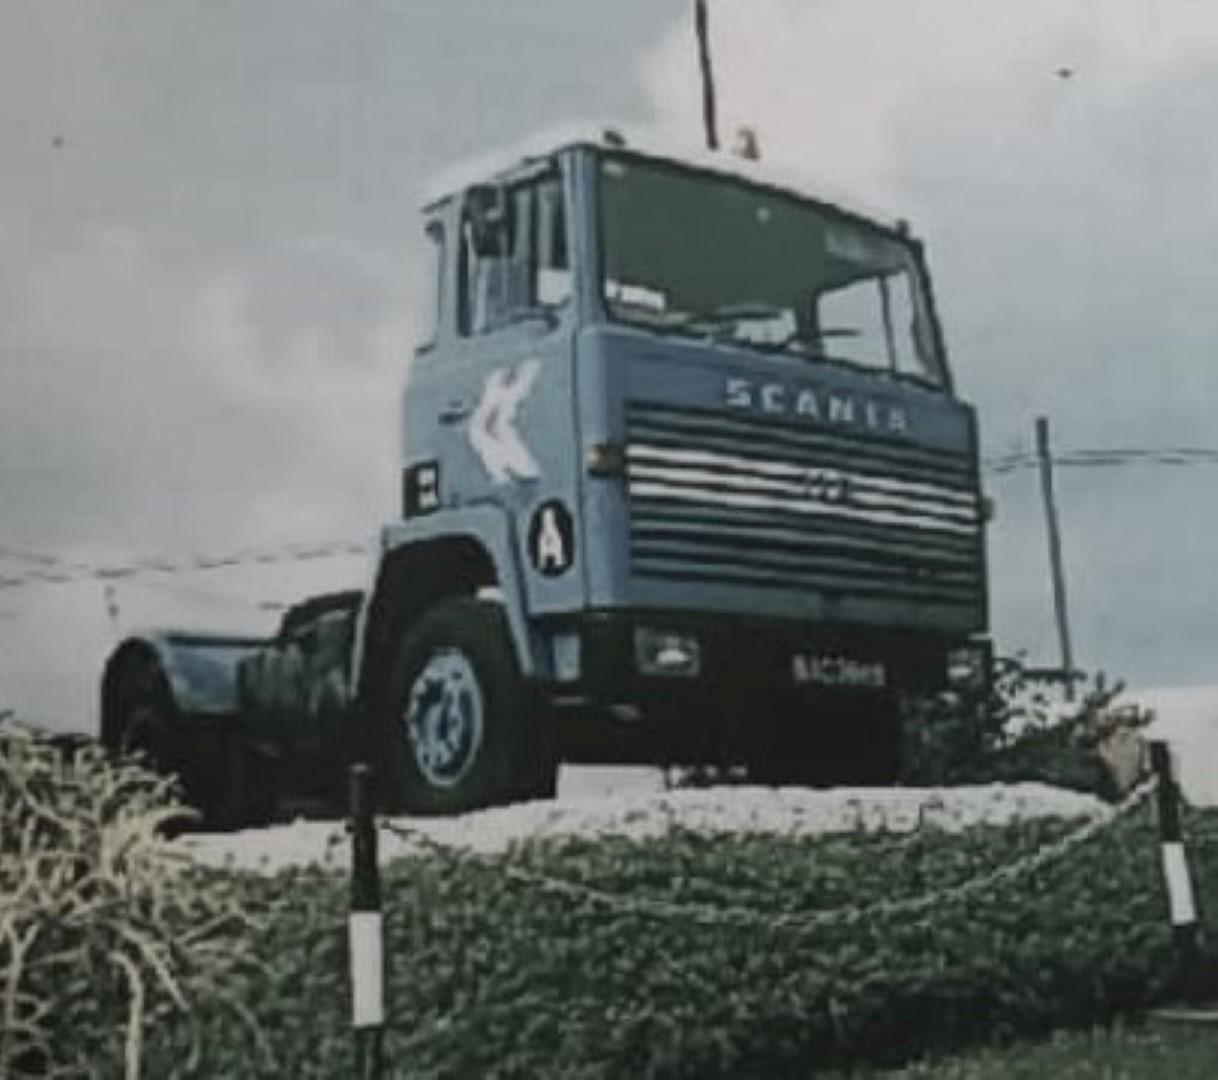 Scania 50 years